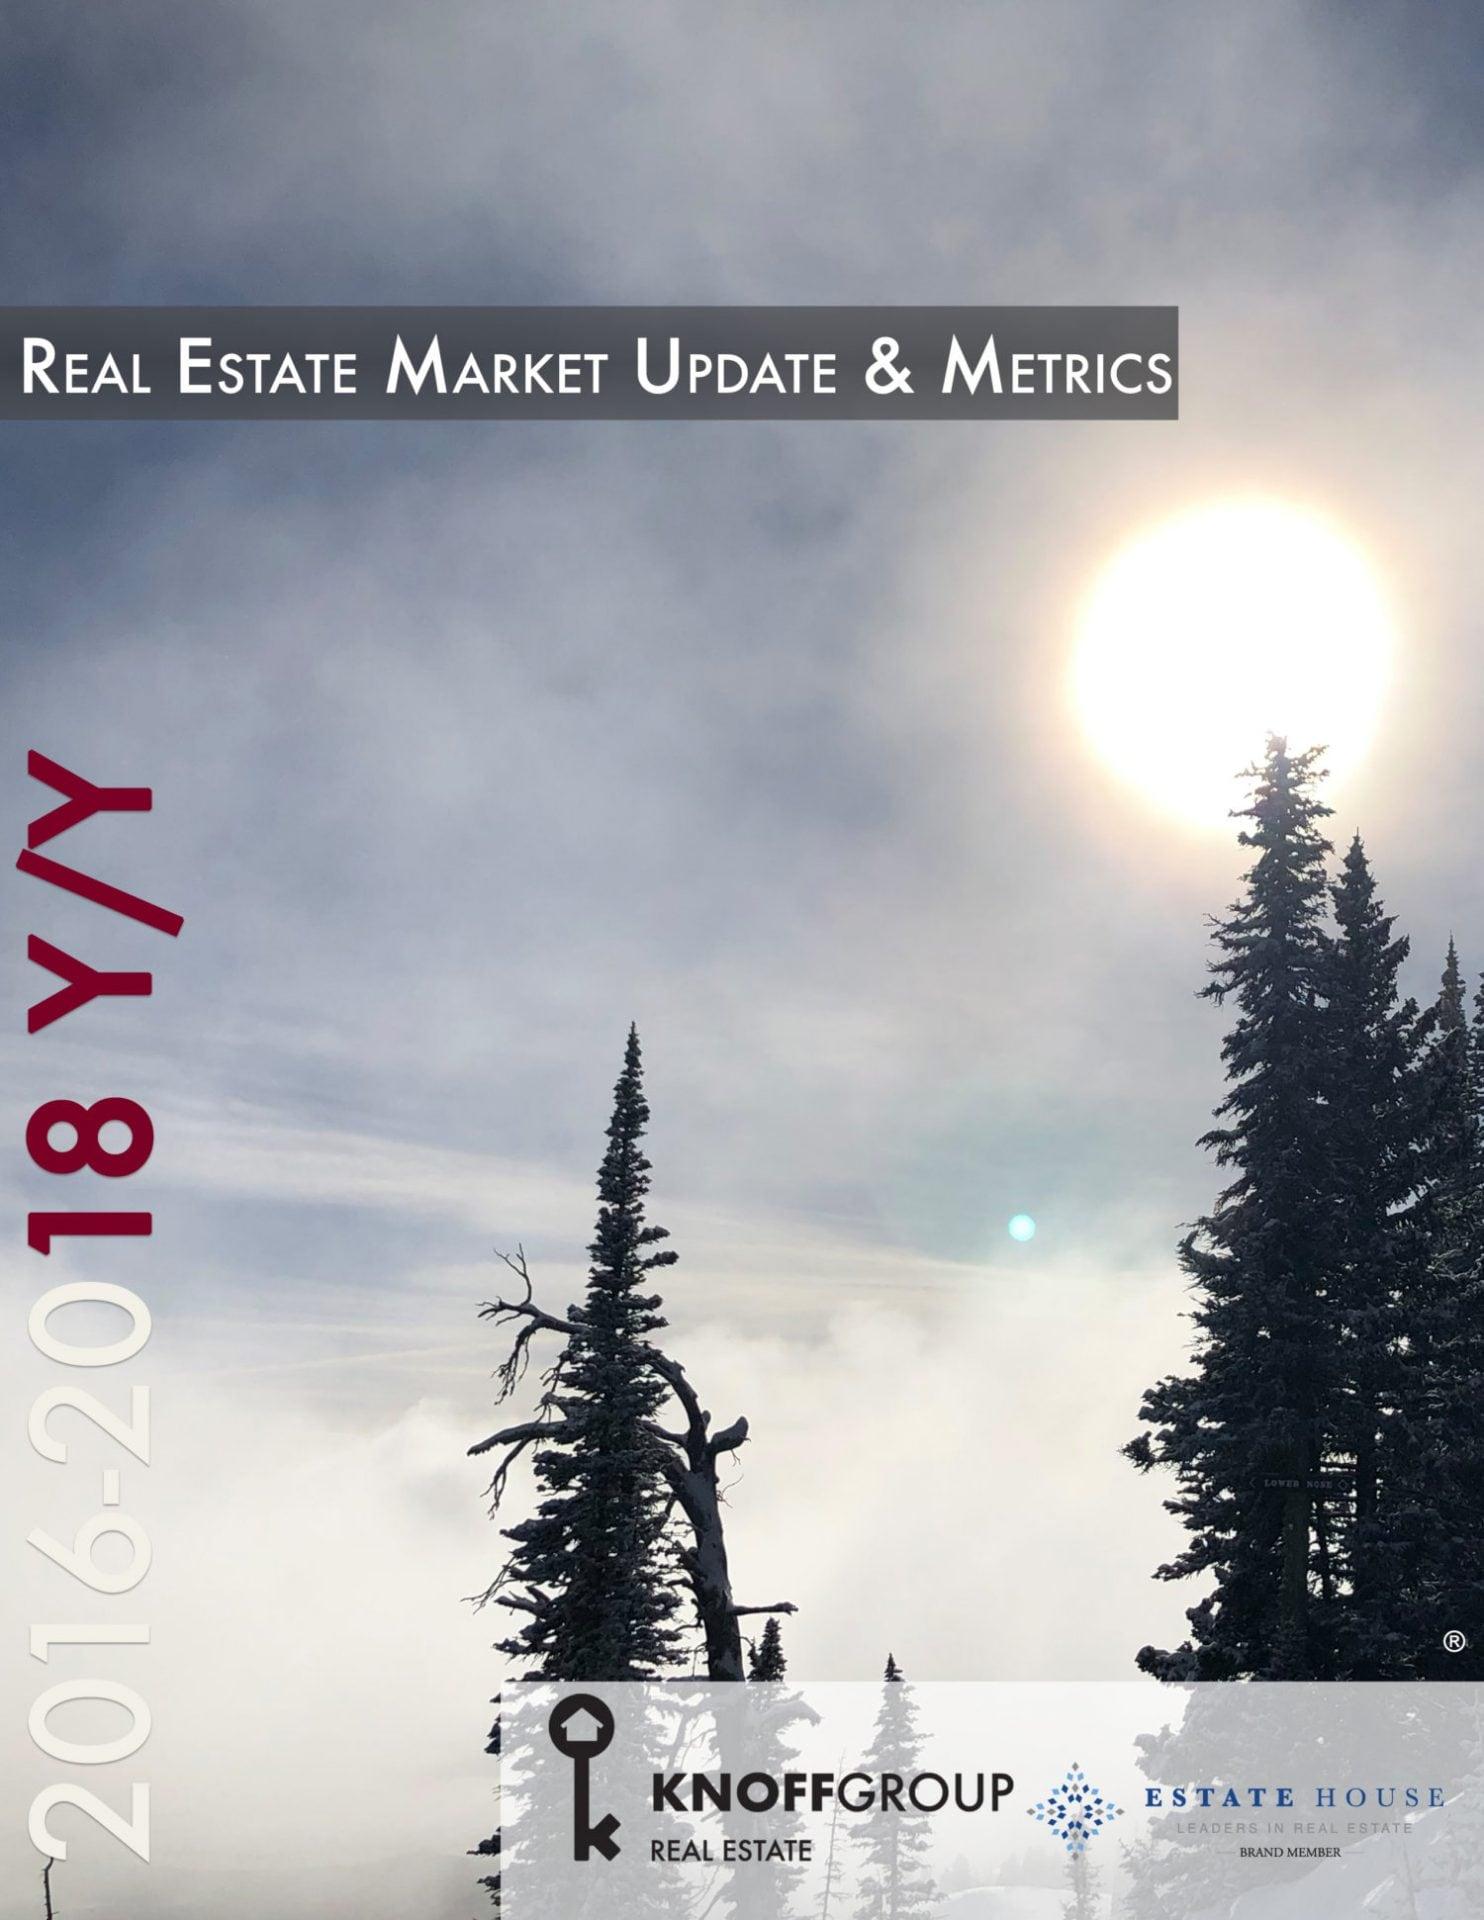 Real Estate Market Update and Metrics 2016-2018